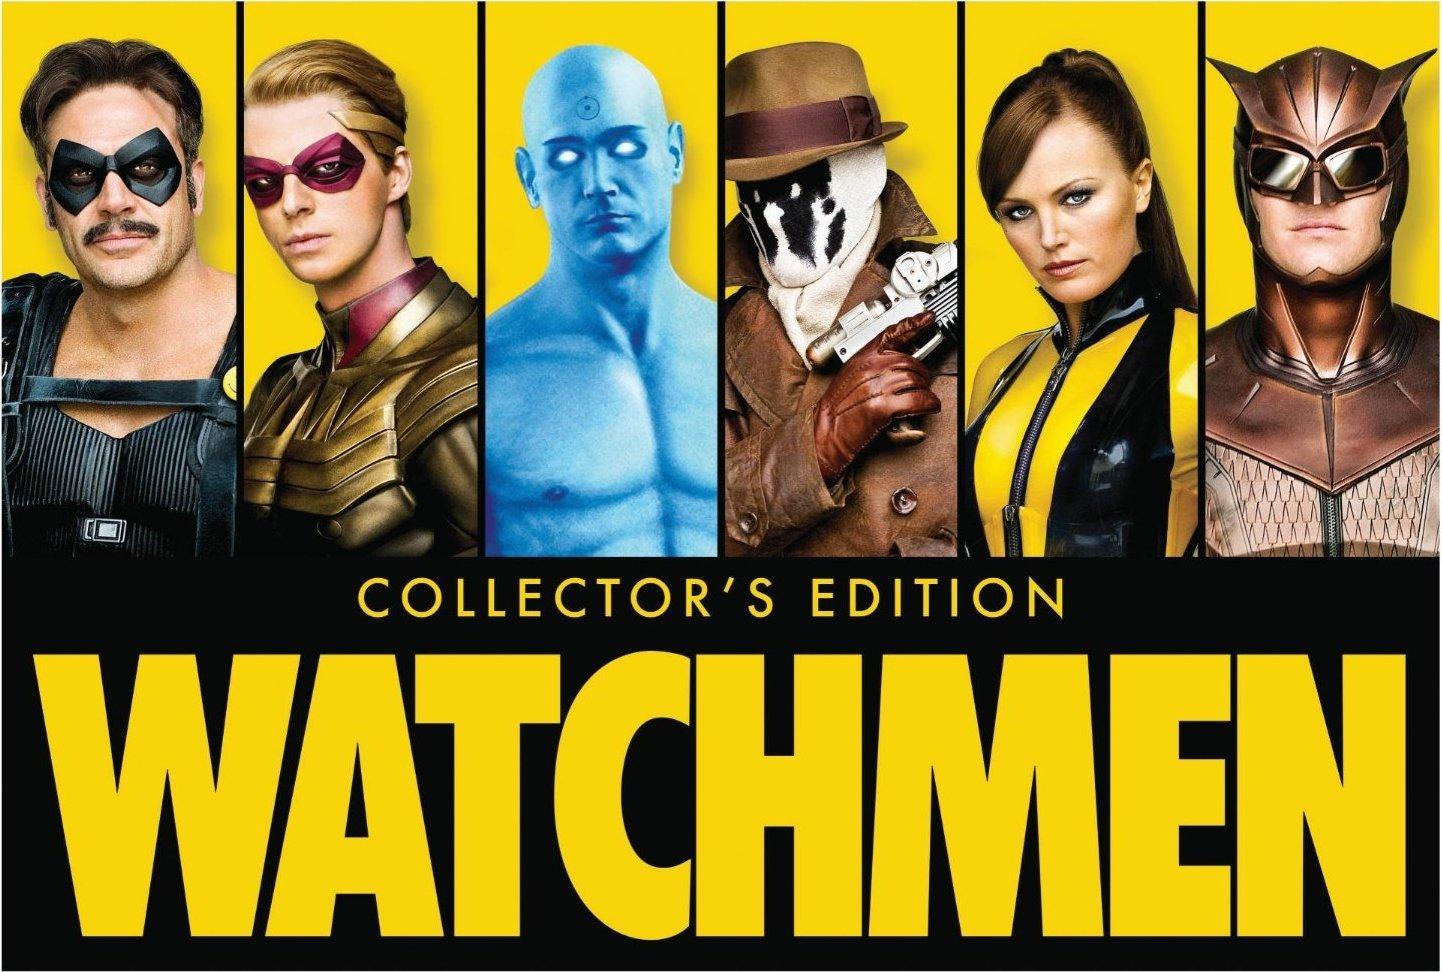 Scenes Watchmen movie sex